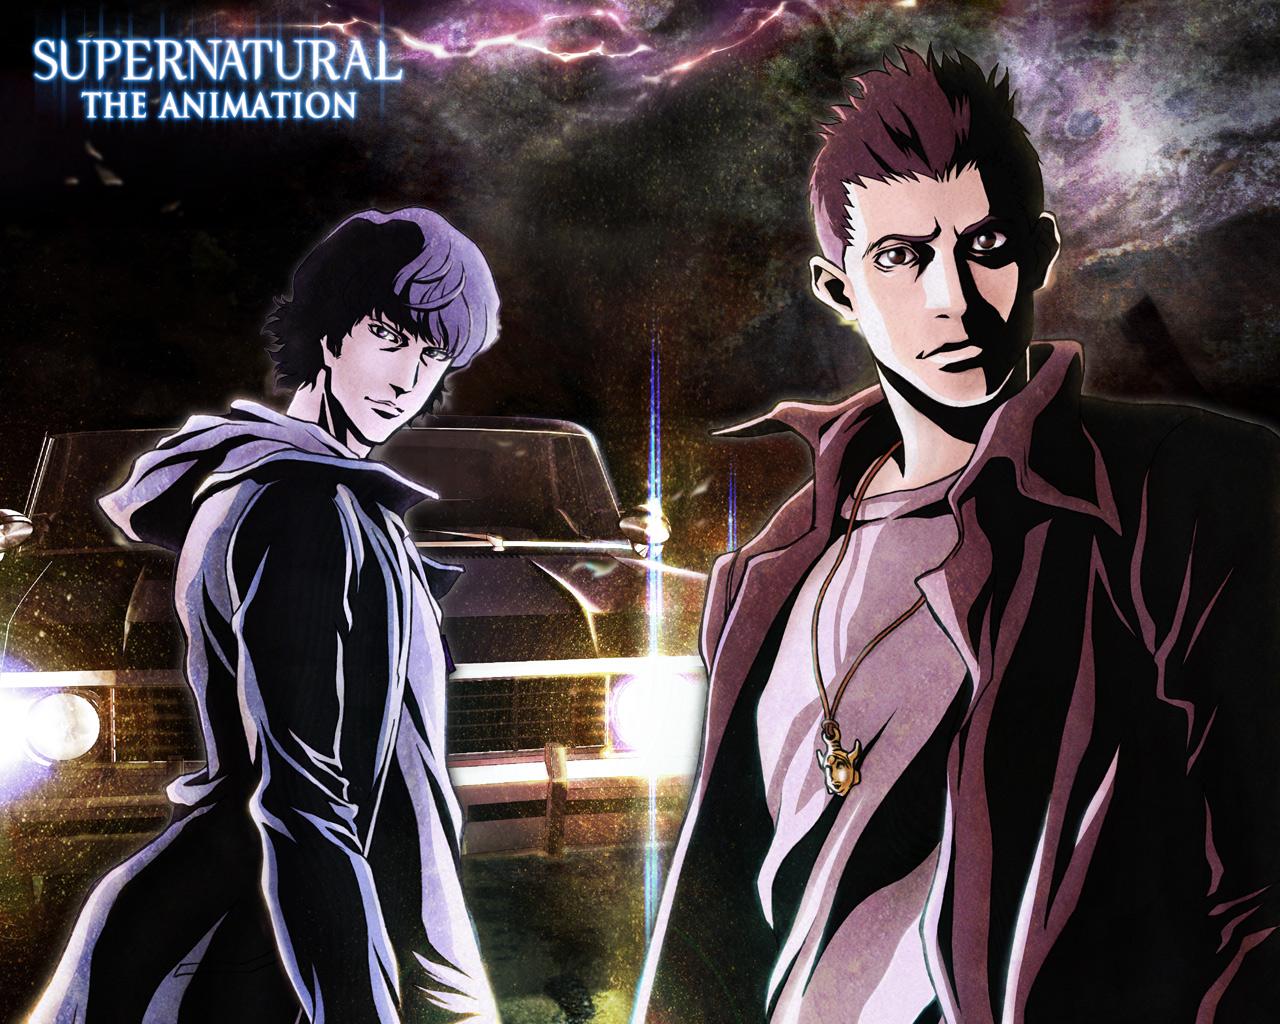 what are good supernatural animeJapan   Its A Wonderful Rife  Supernatural  The Animation U5tgslTx